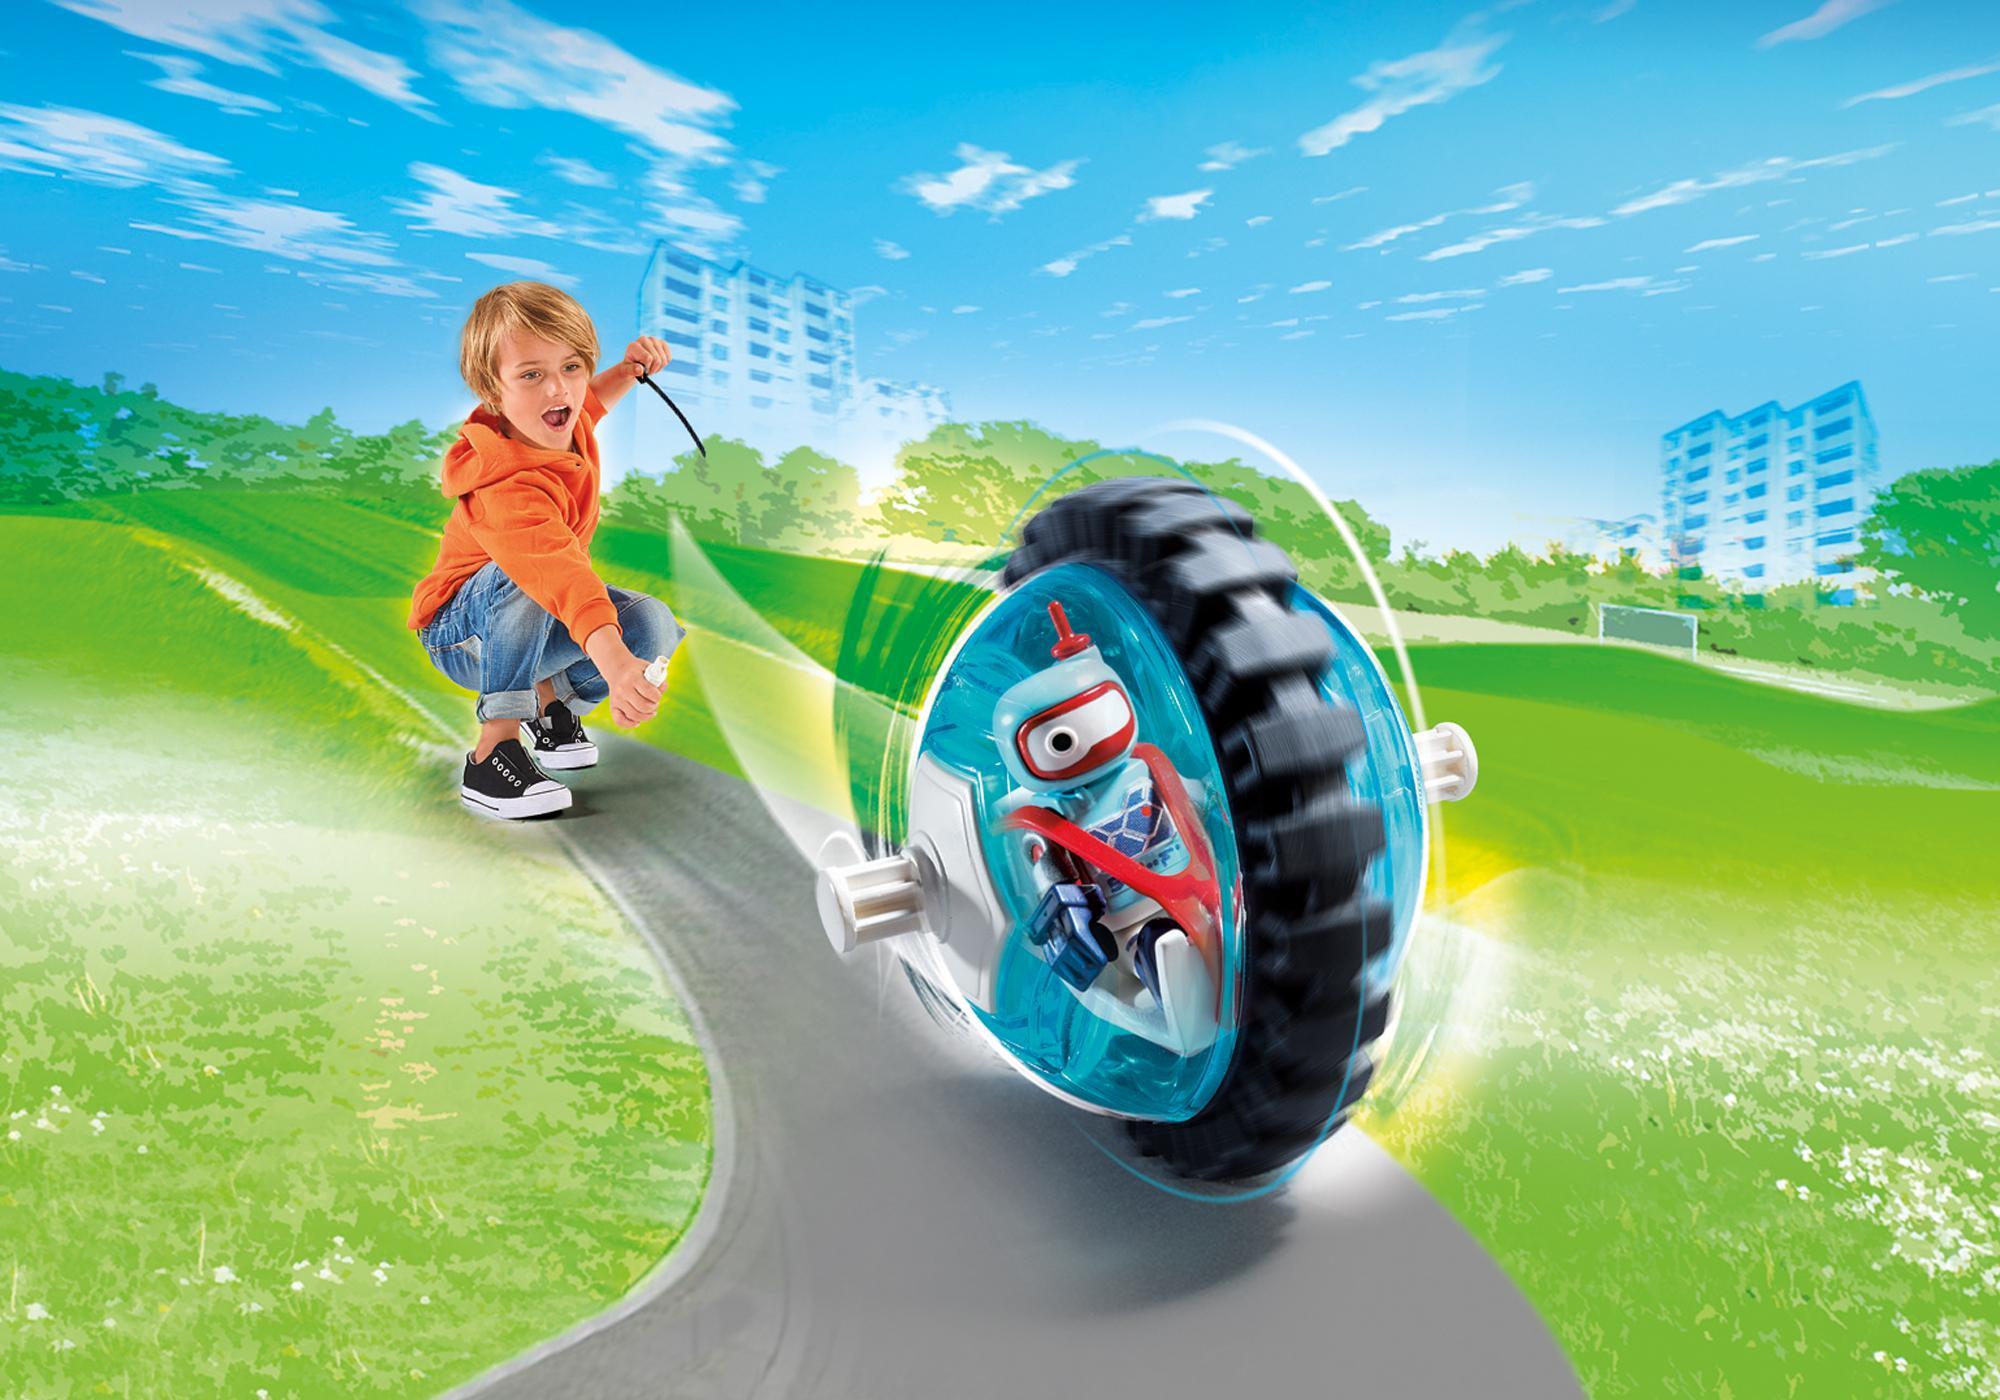 http://media.playmobil.com/i/playmobil/9204_product_detail/Blue Roller Racer